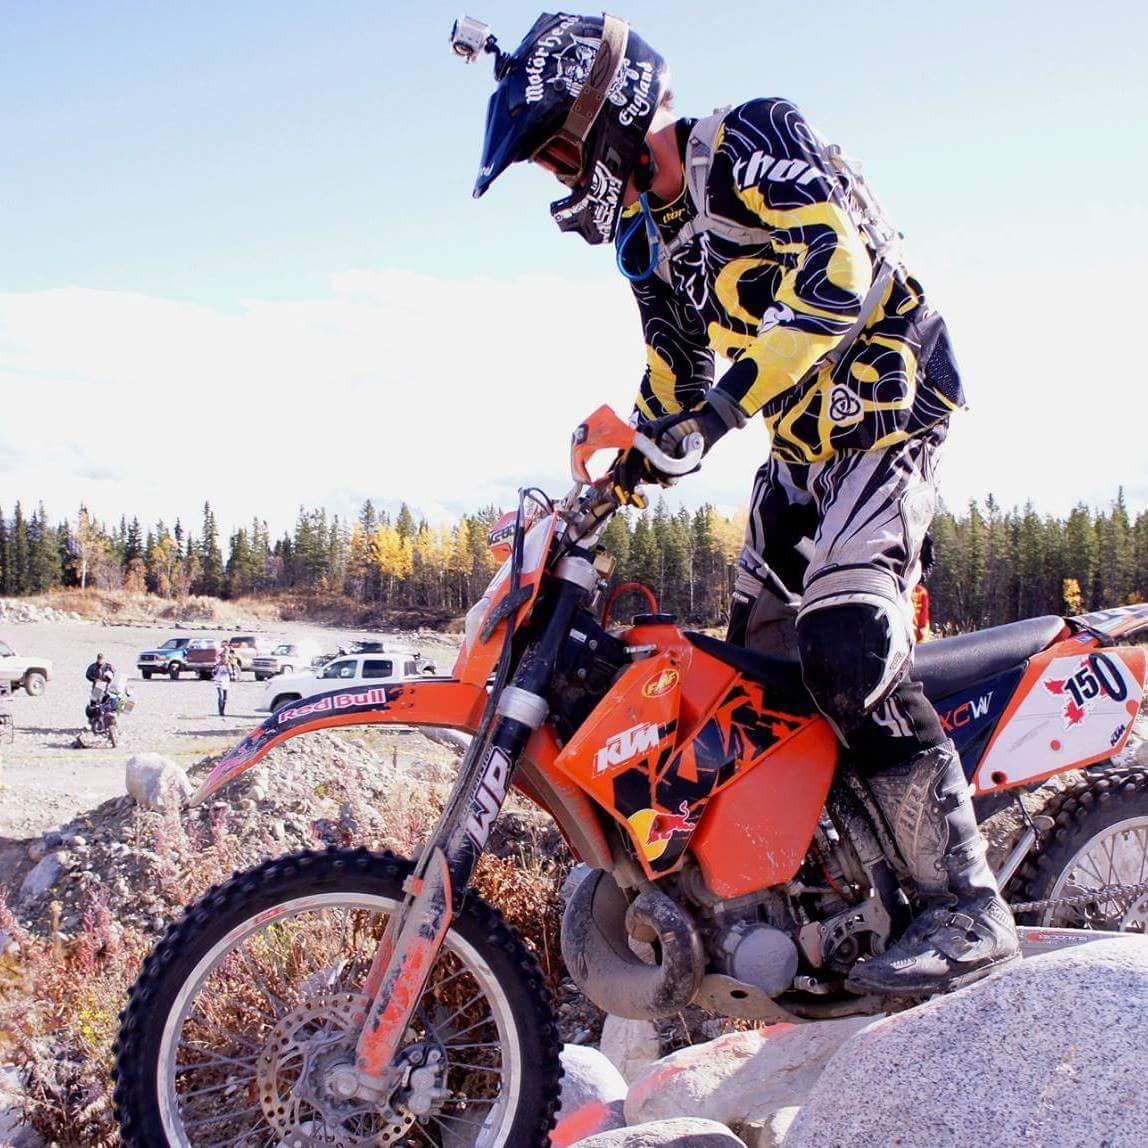 motorcross with rotationplasty